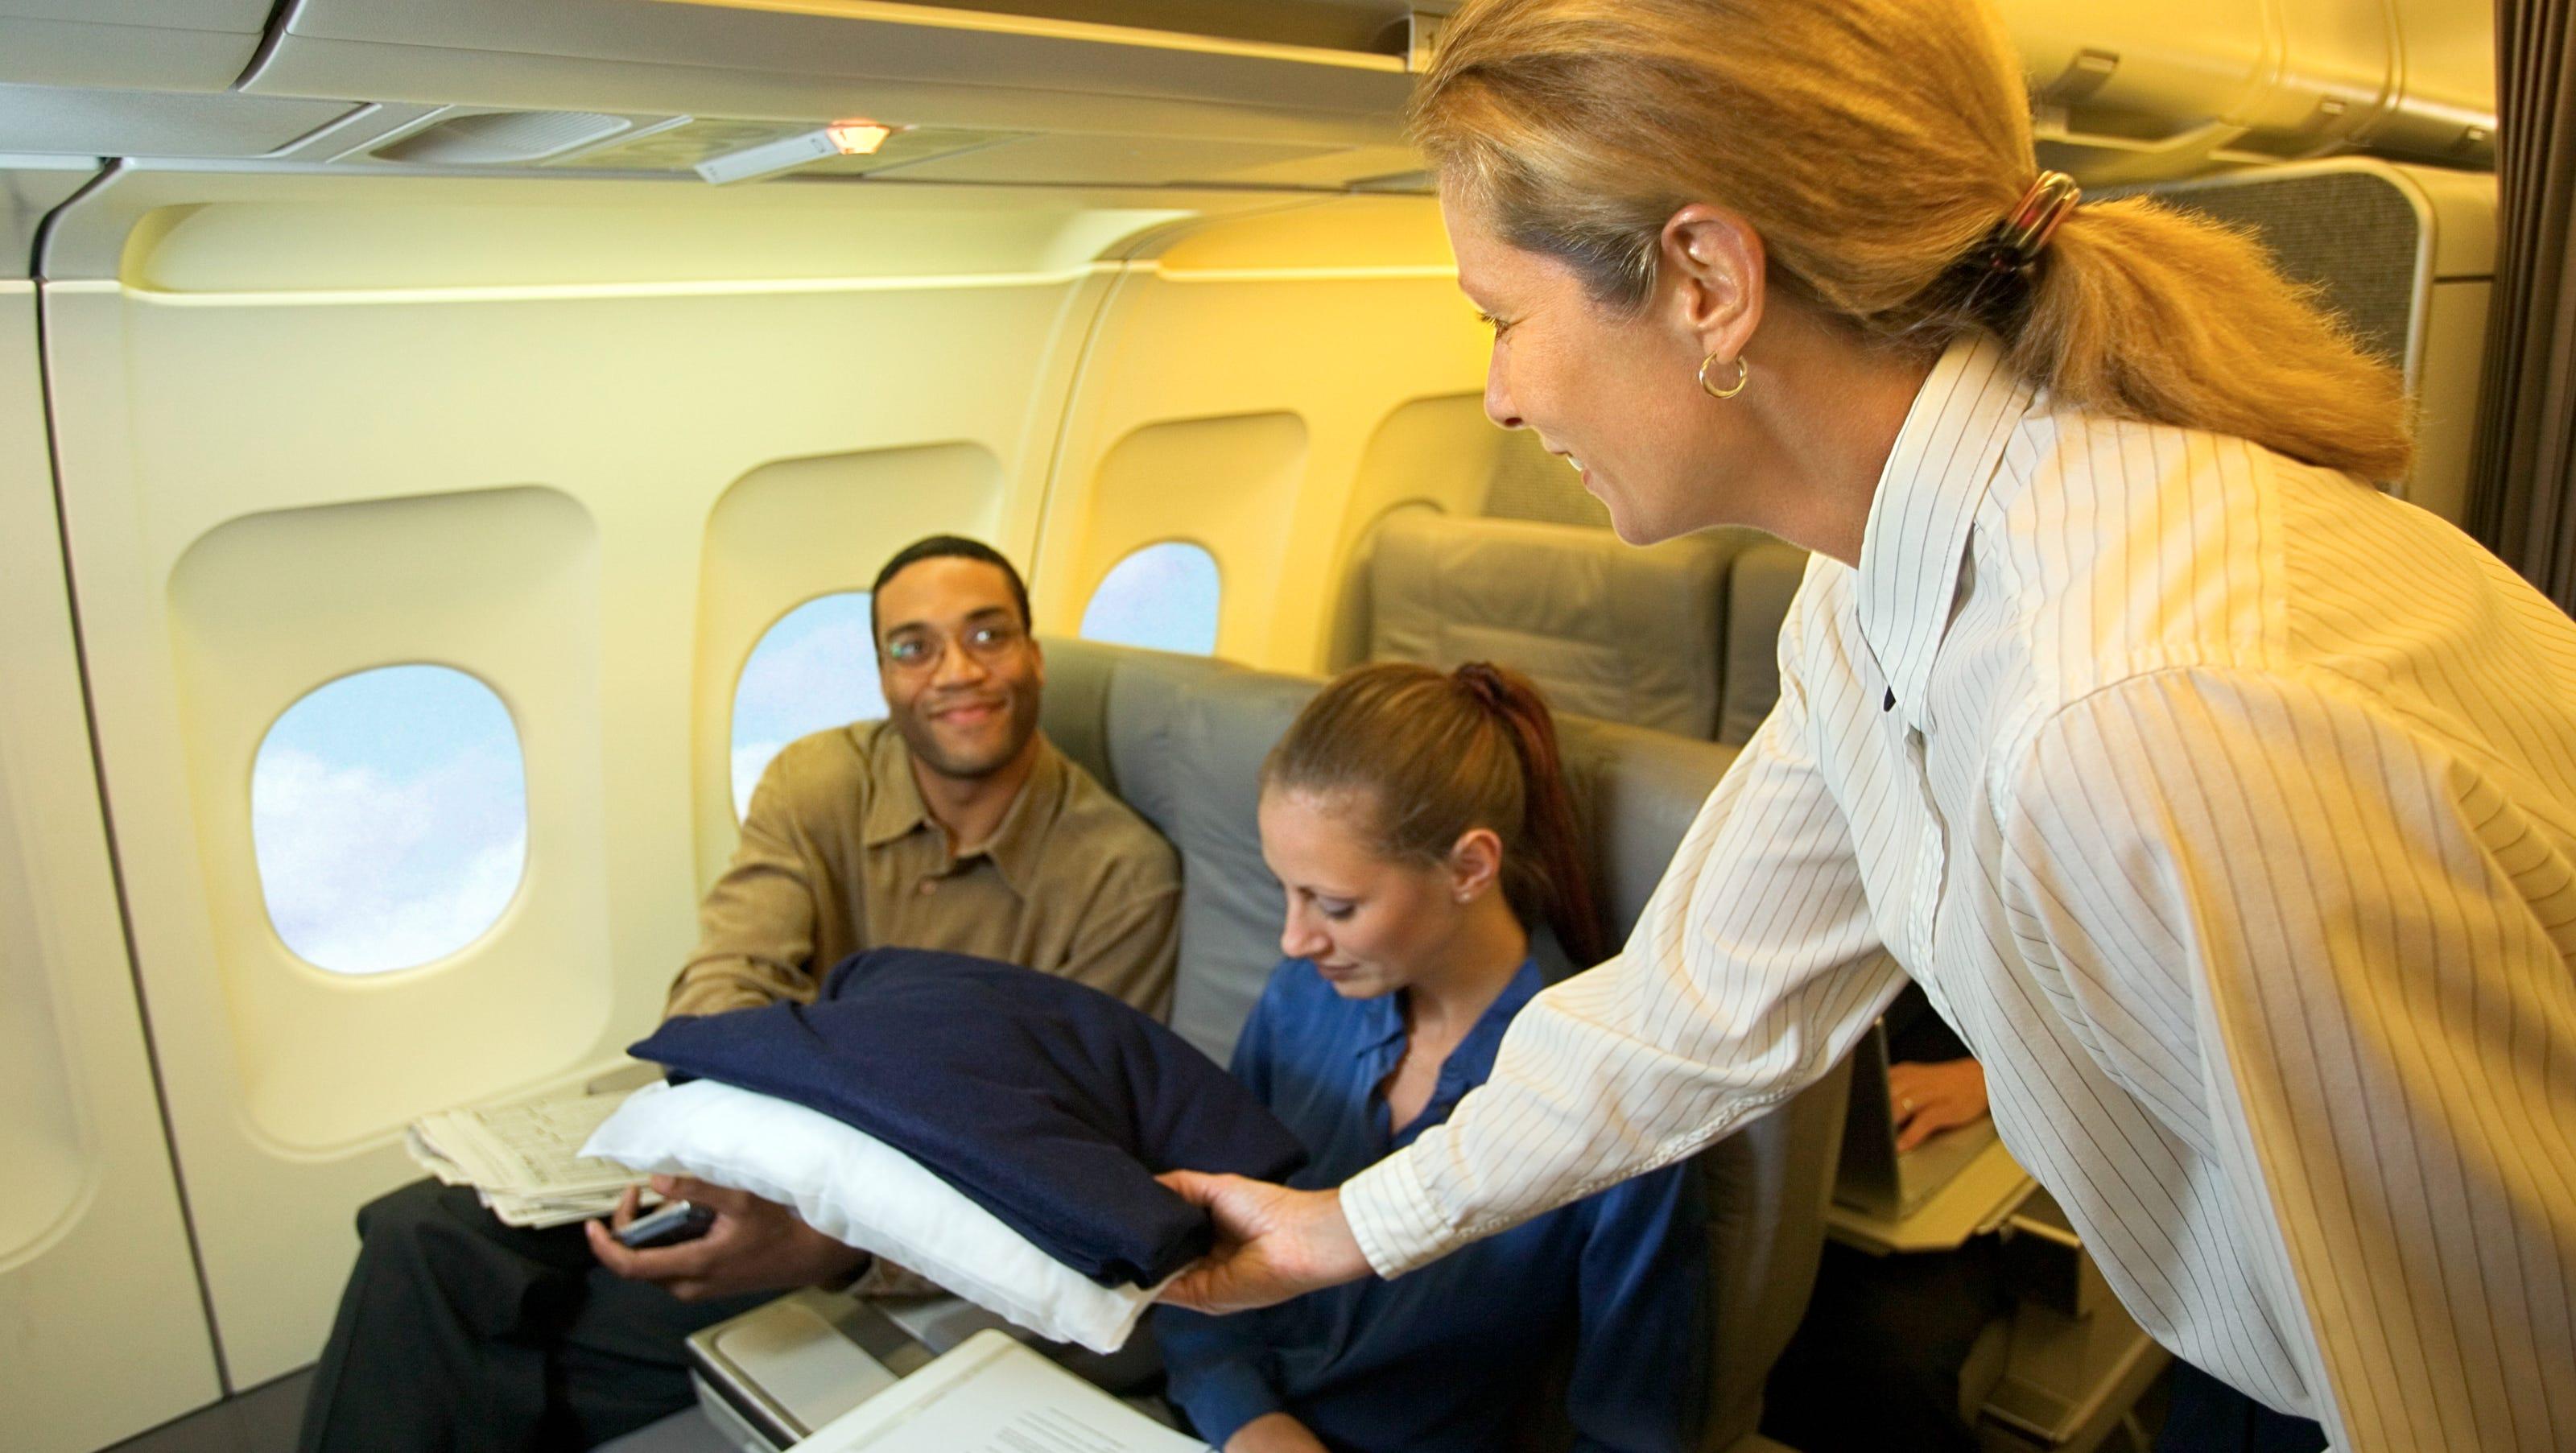 Image result for flight attendant giving free